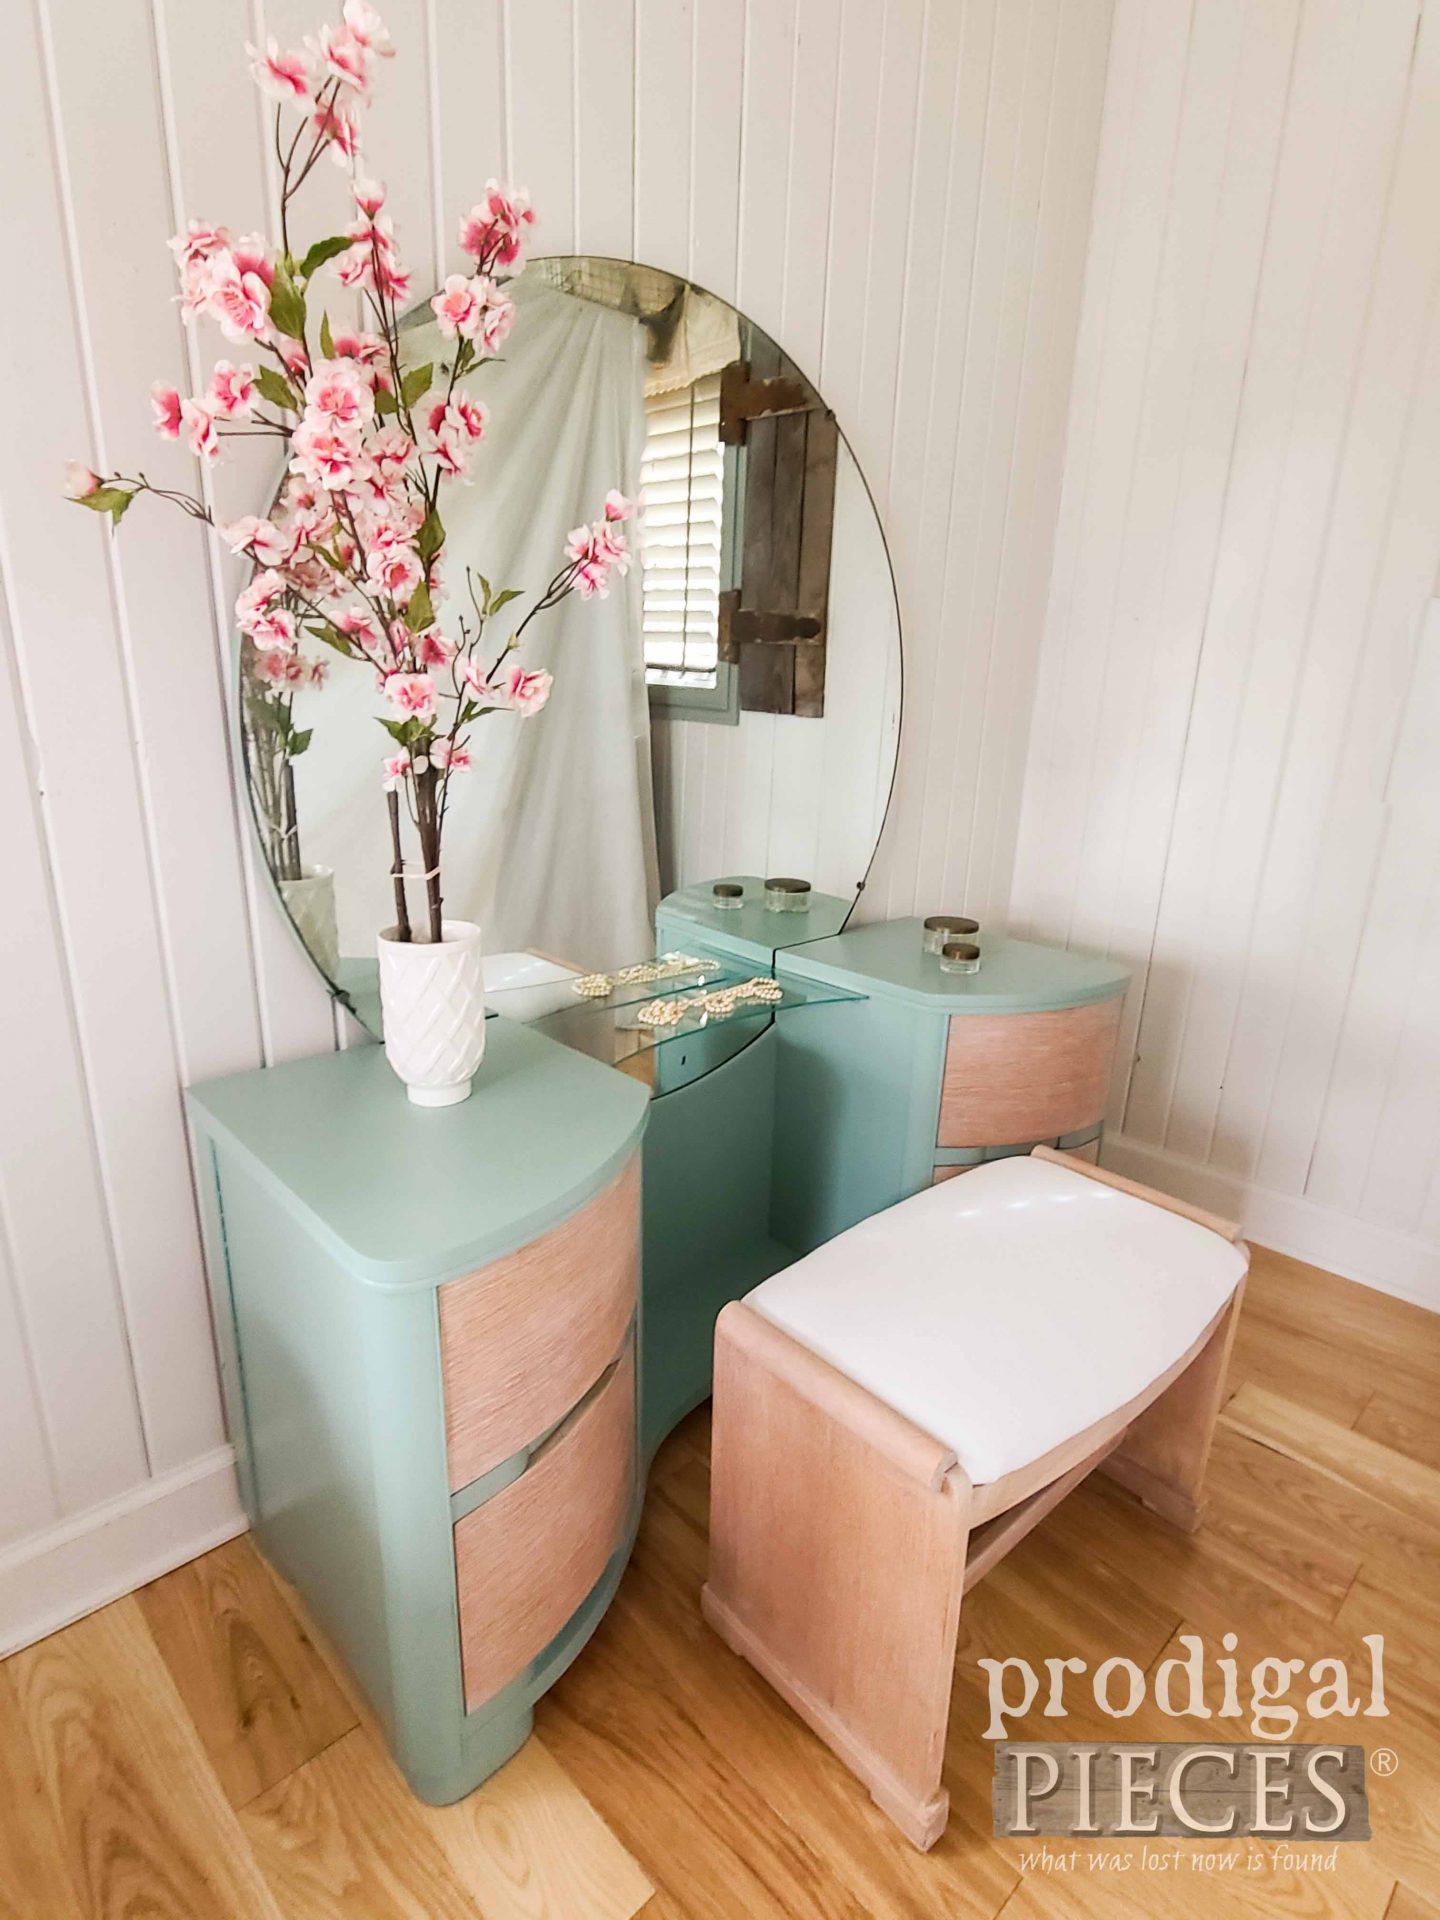 Side View Art Deco Dressing Table Refinished by Larissa of Prodigal Pieces | prodigalpieces.com #prodigalpieces #furniture #vintage #artdeco #boho